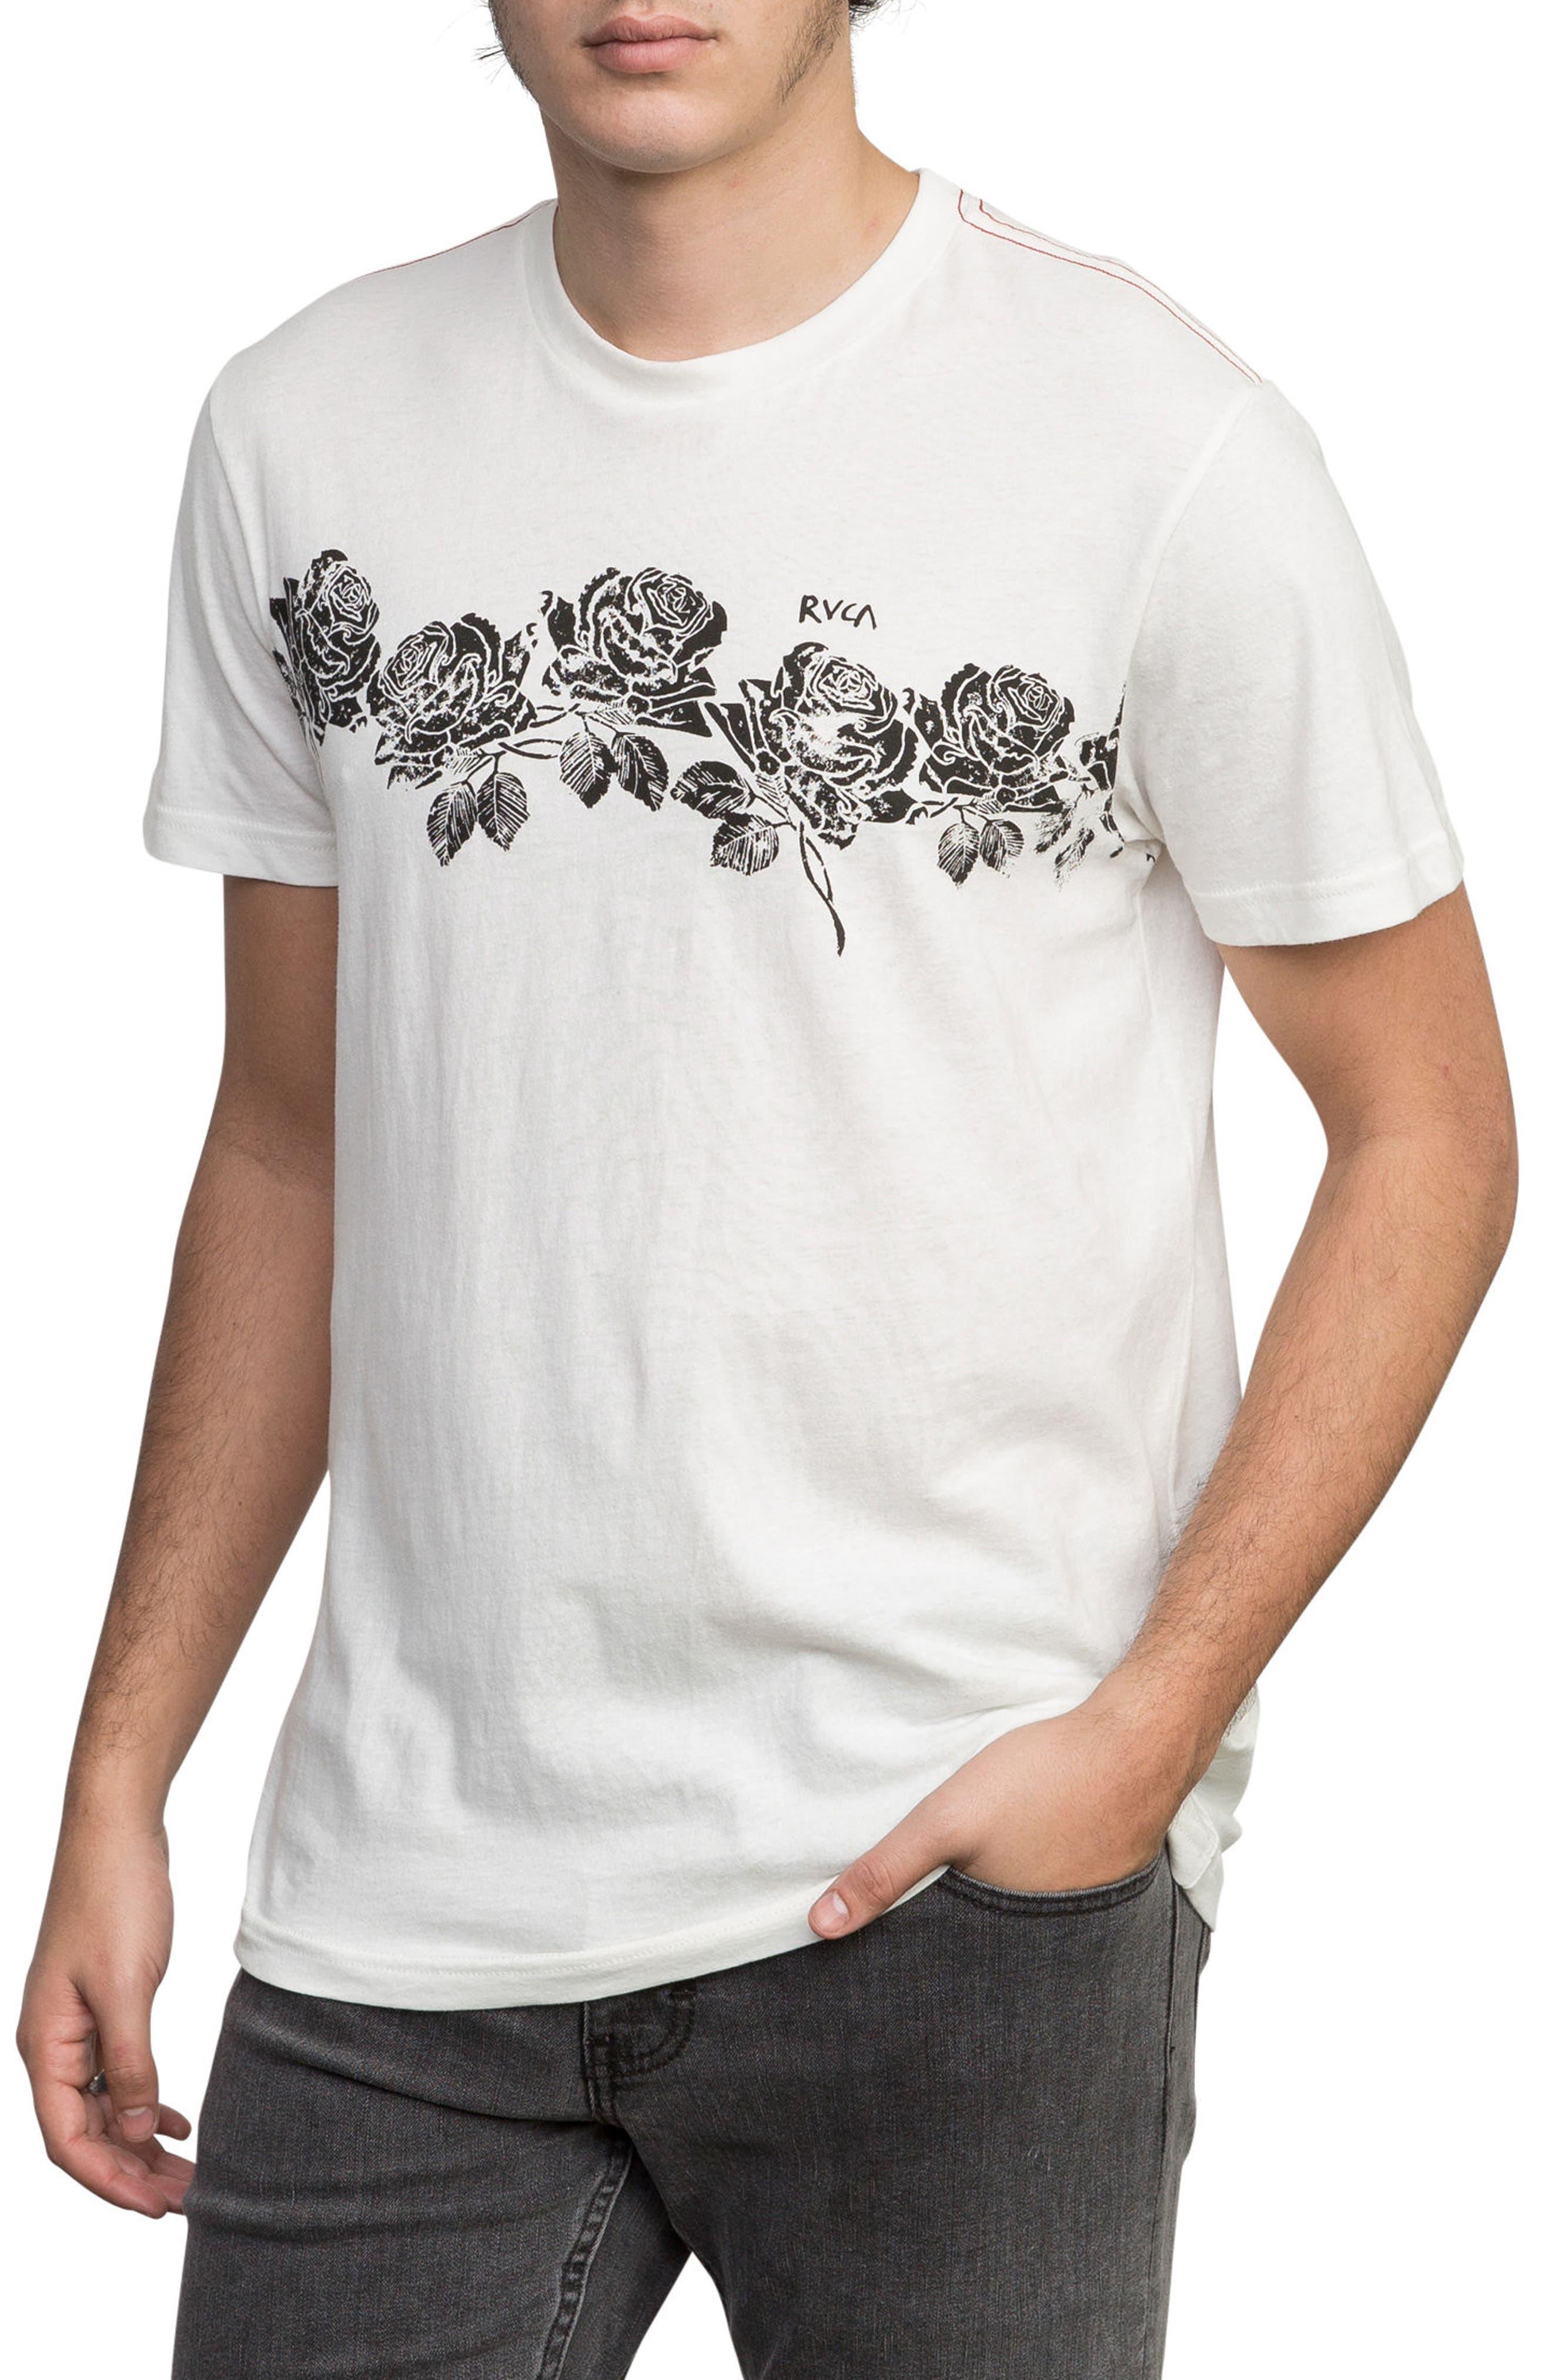 Oblow Roses T-Shirt,                             Alternate thumbnail 3, color,                             ANTIQUE WHITE